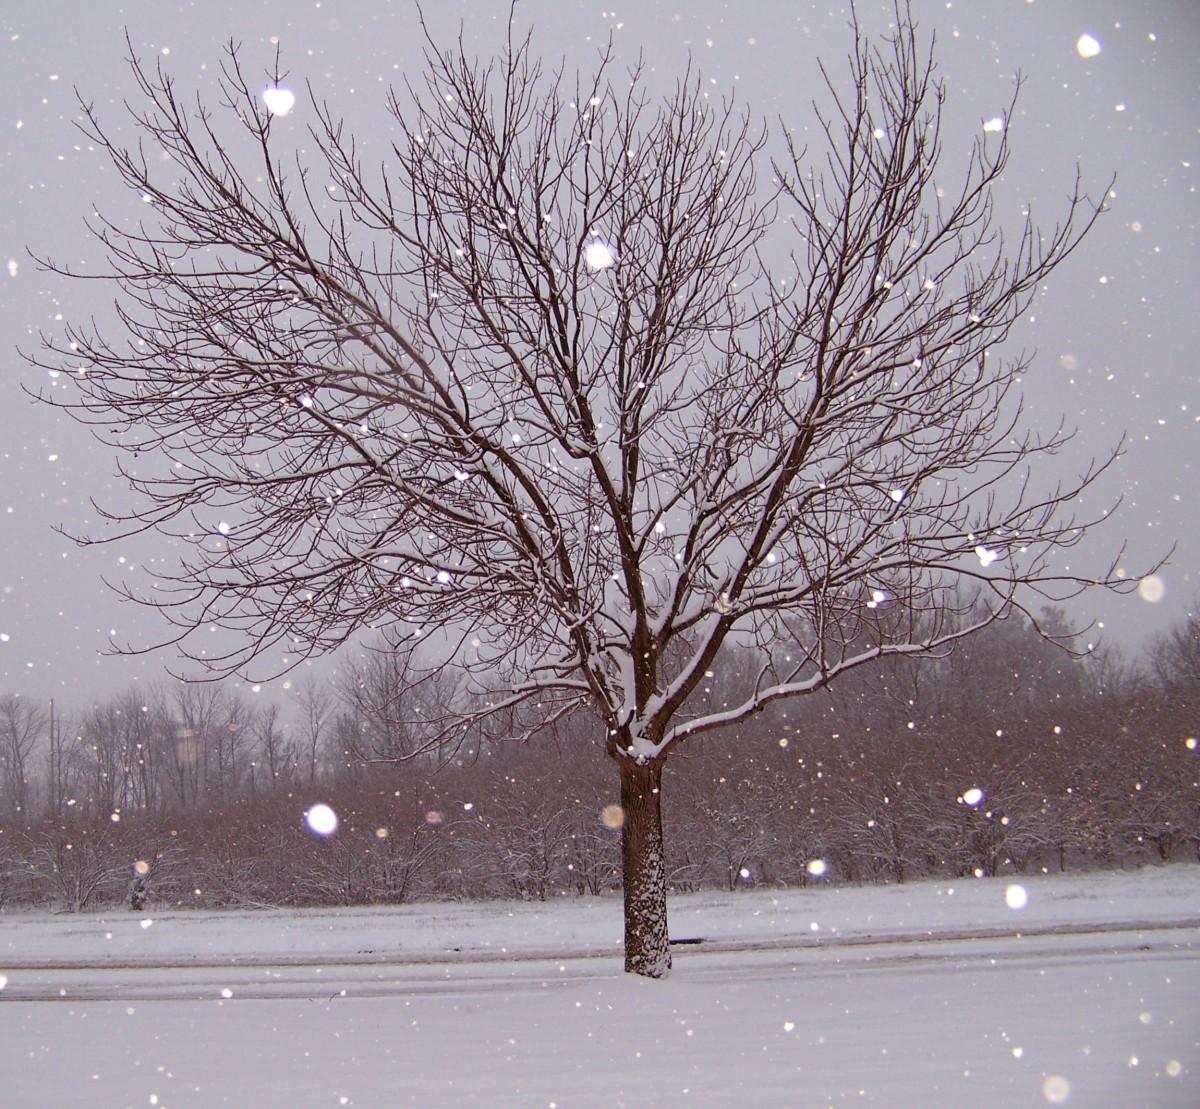 Snowy Twig Christmas Trees